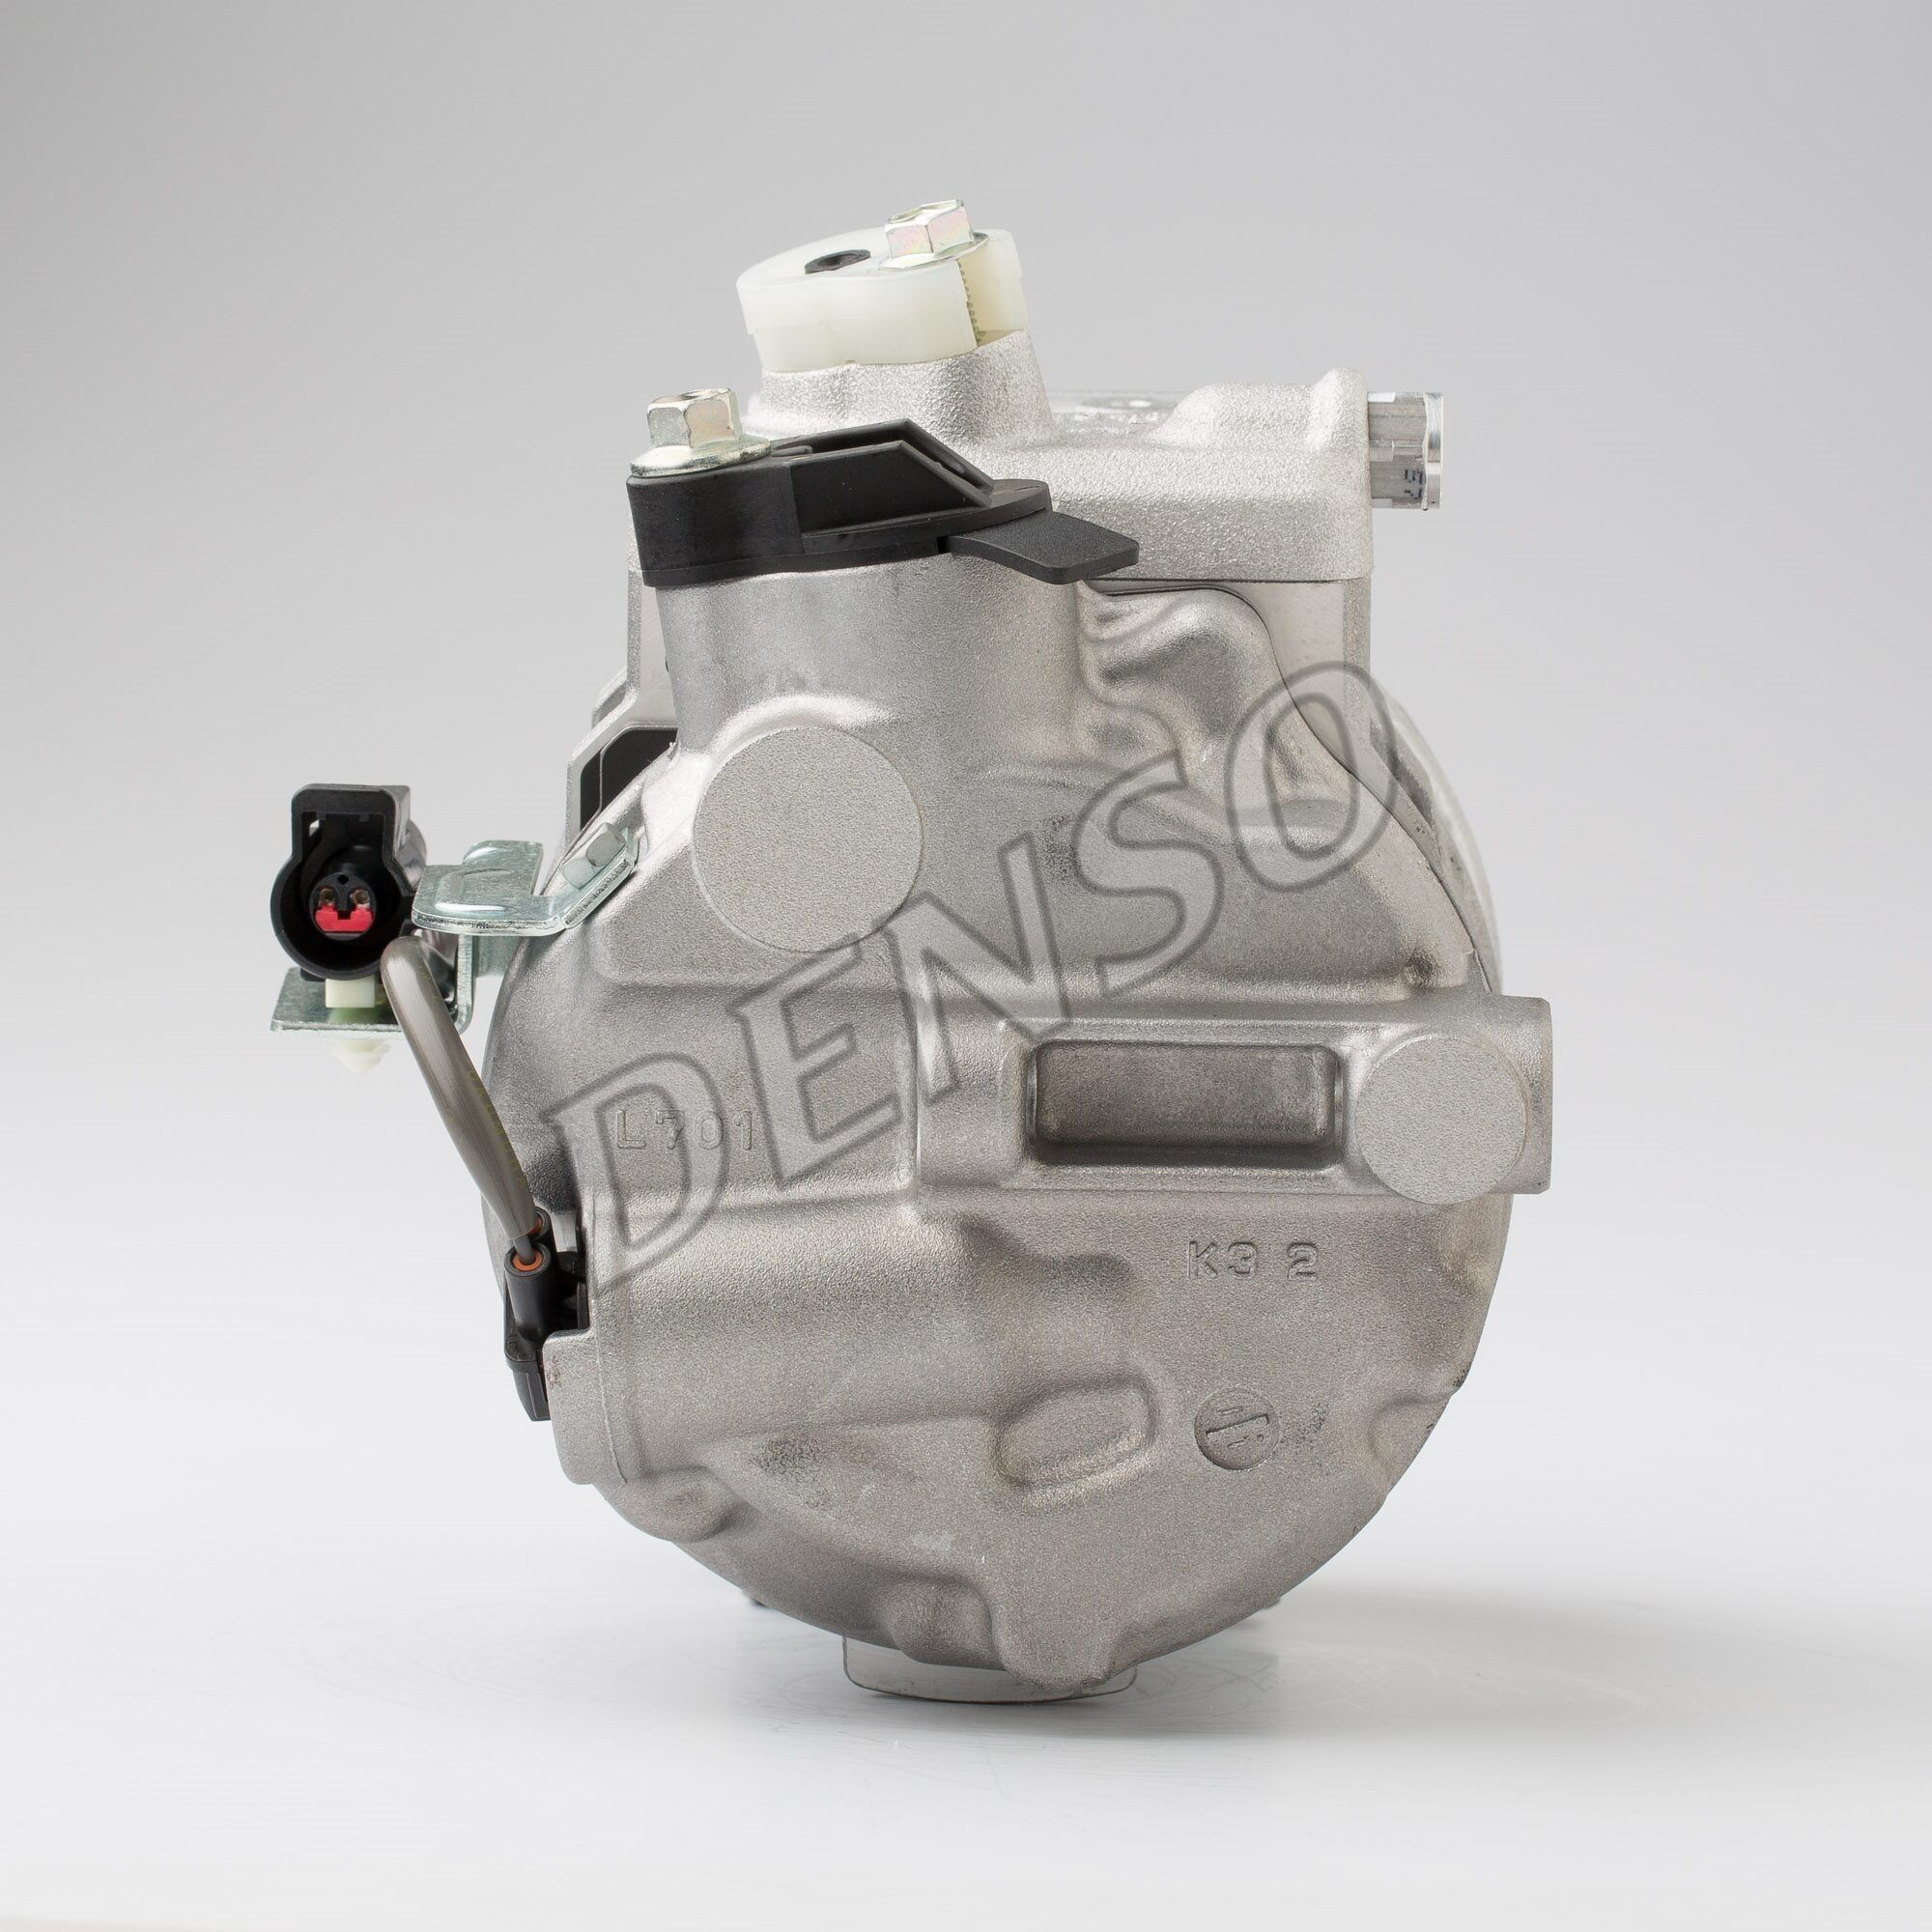 DENSO | Klimakompressor DCP14013